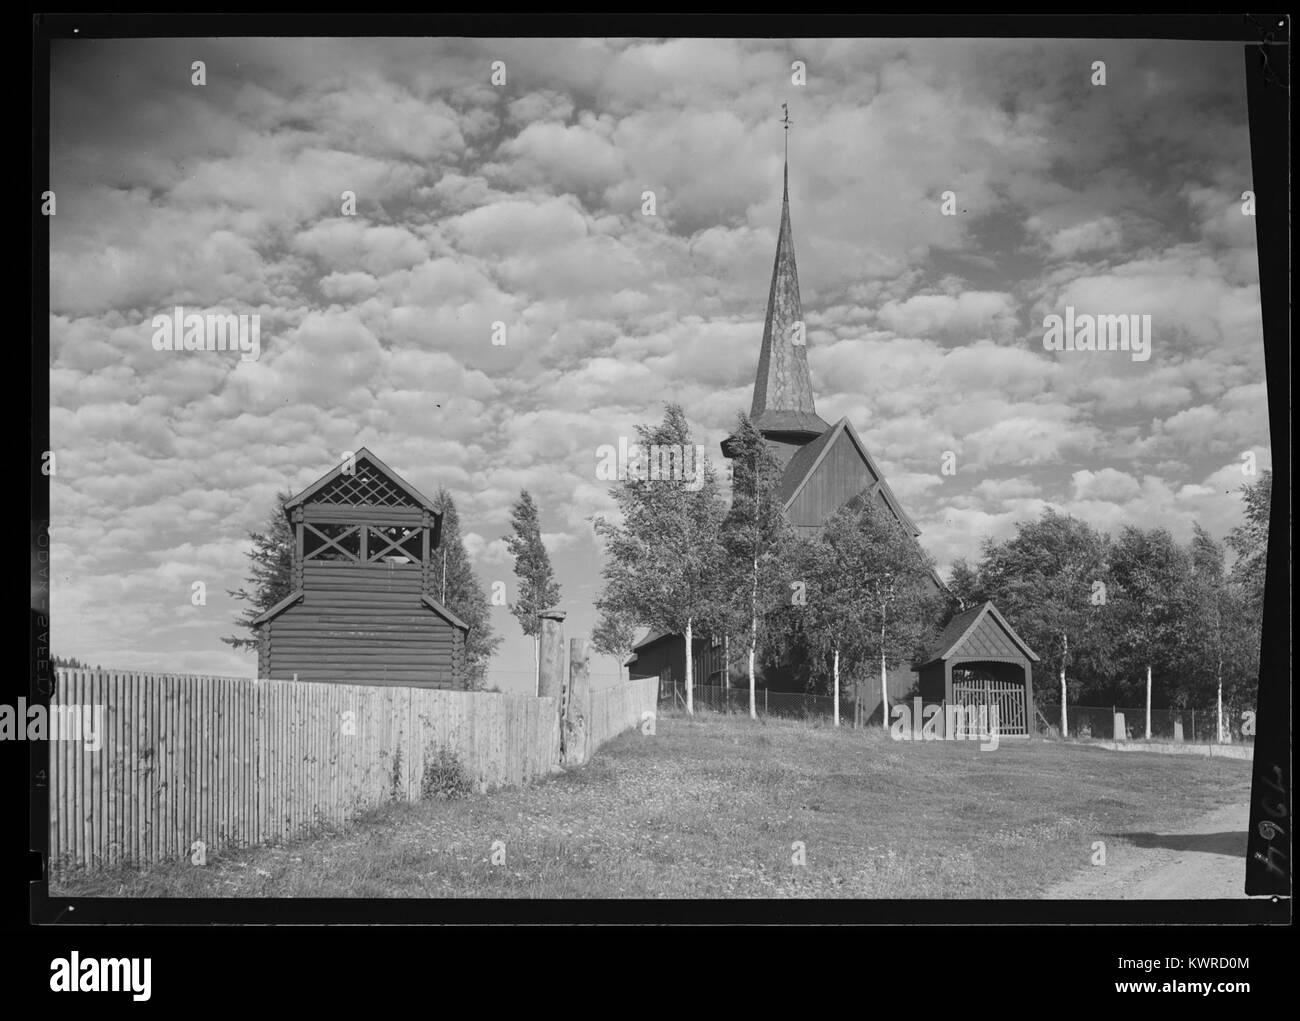 Øystre Slidre - no-nb digifoto 20160303 00052 NB MIT FNR 07064 - Stock Image